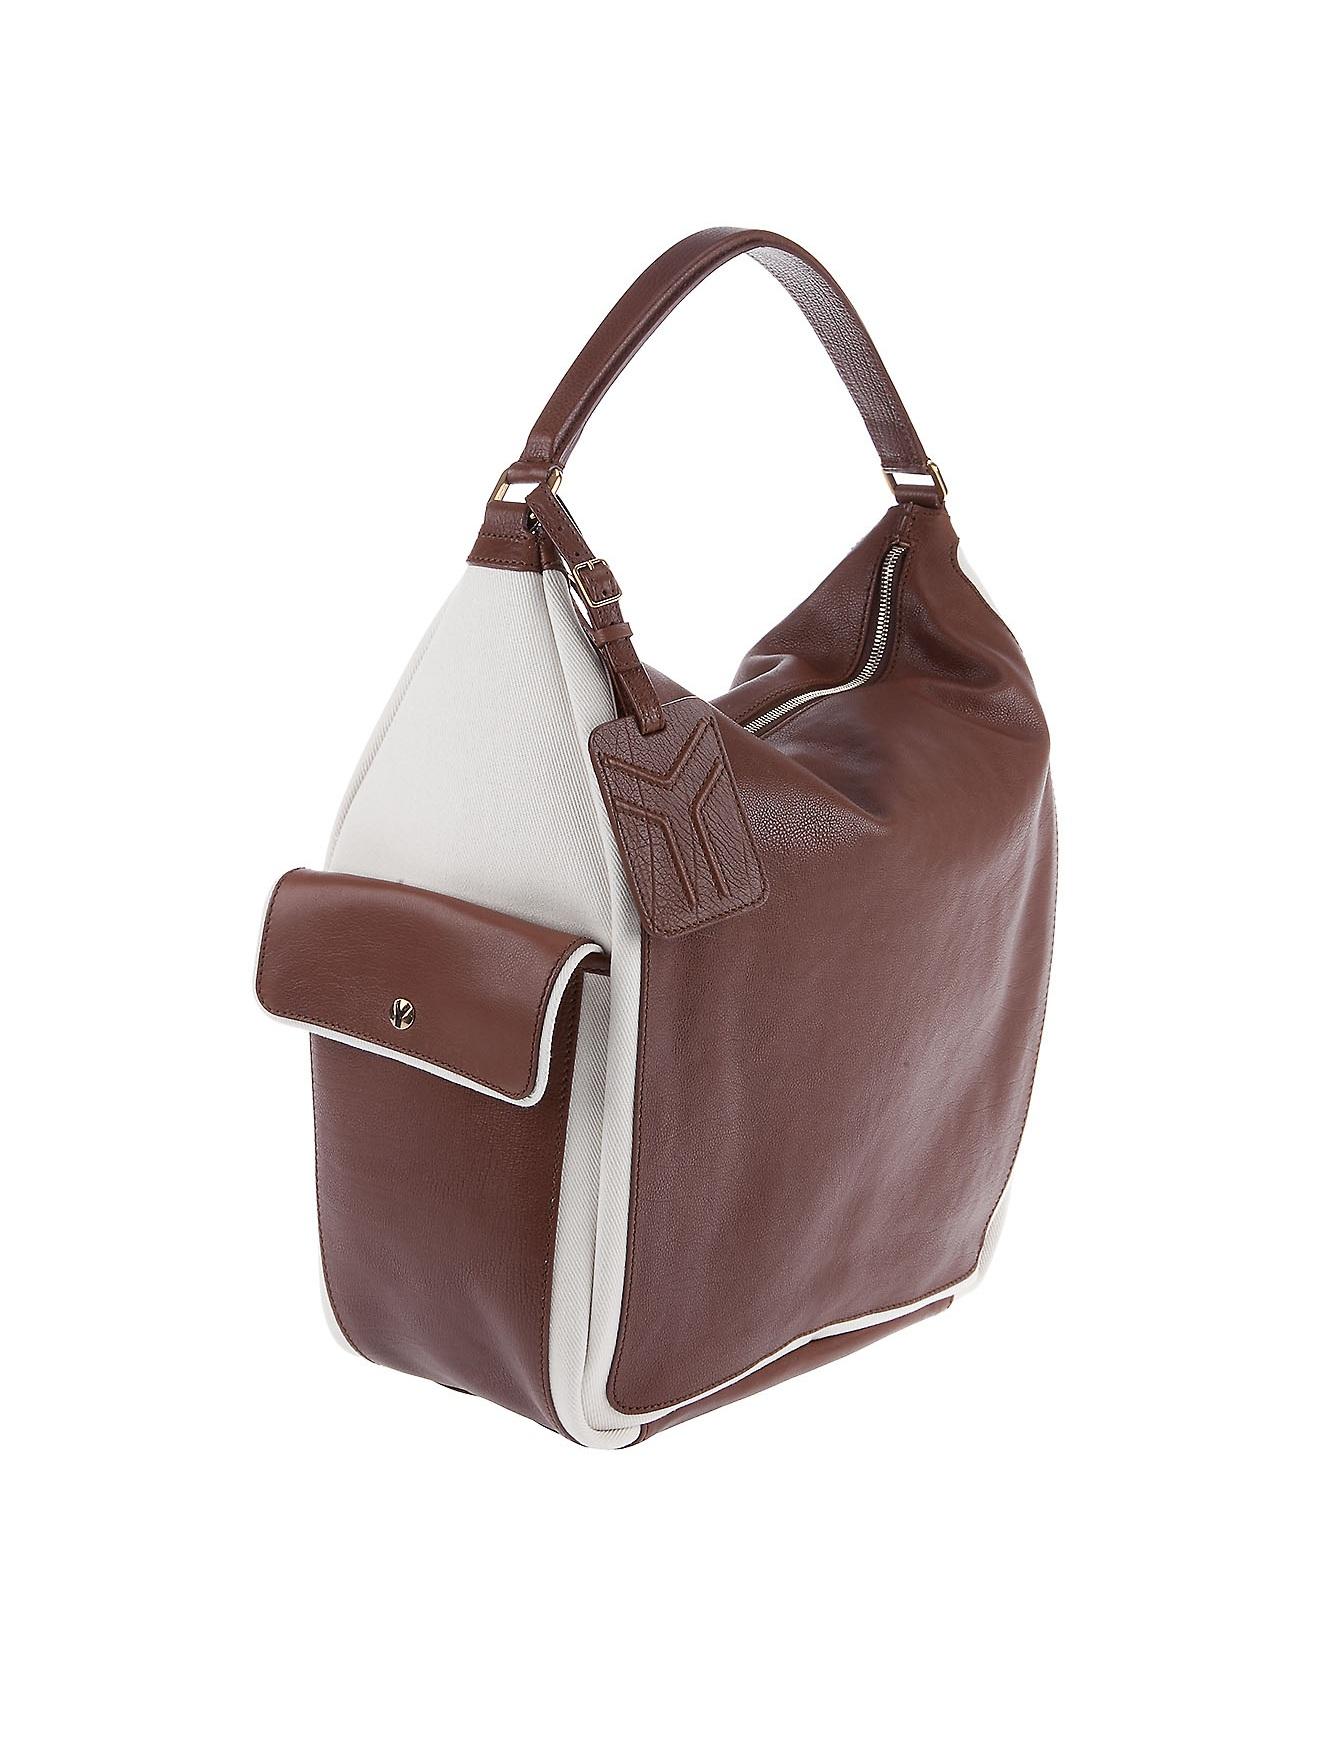 Saint laurent Multi Bag in Brown   Lyst